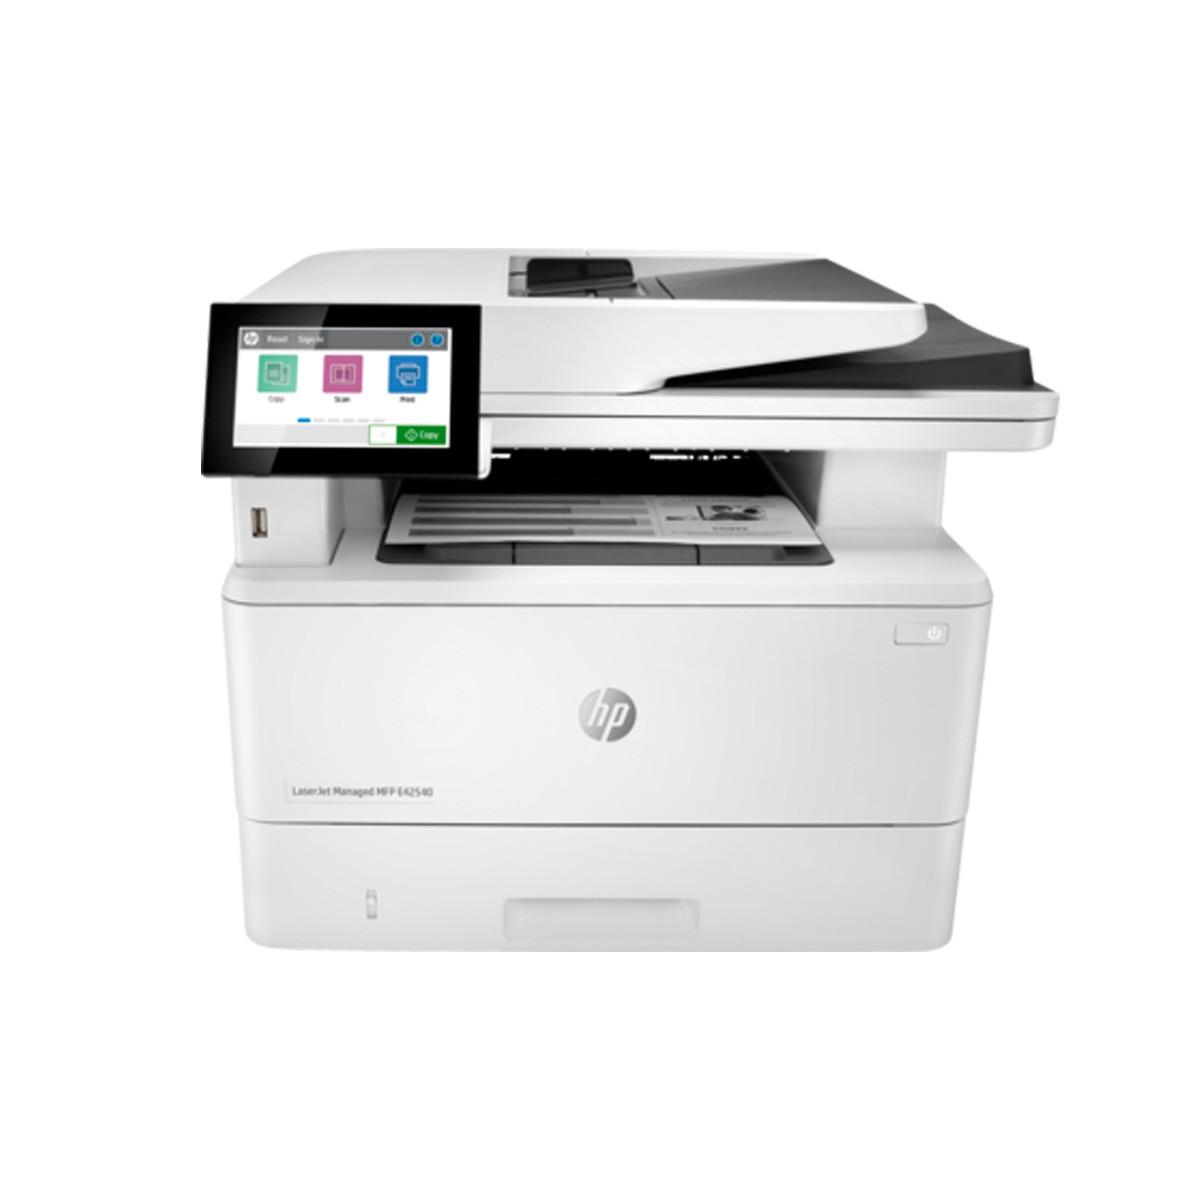 Impressora HP LaserJet Managed E42540f 3PZ75A | Multifuncional com USB e Duplex